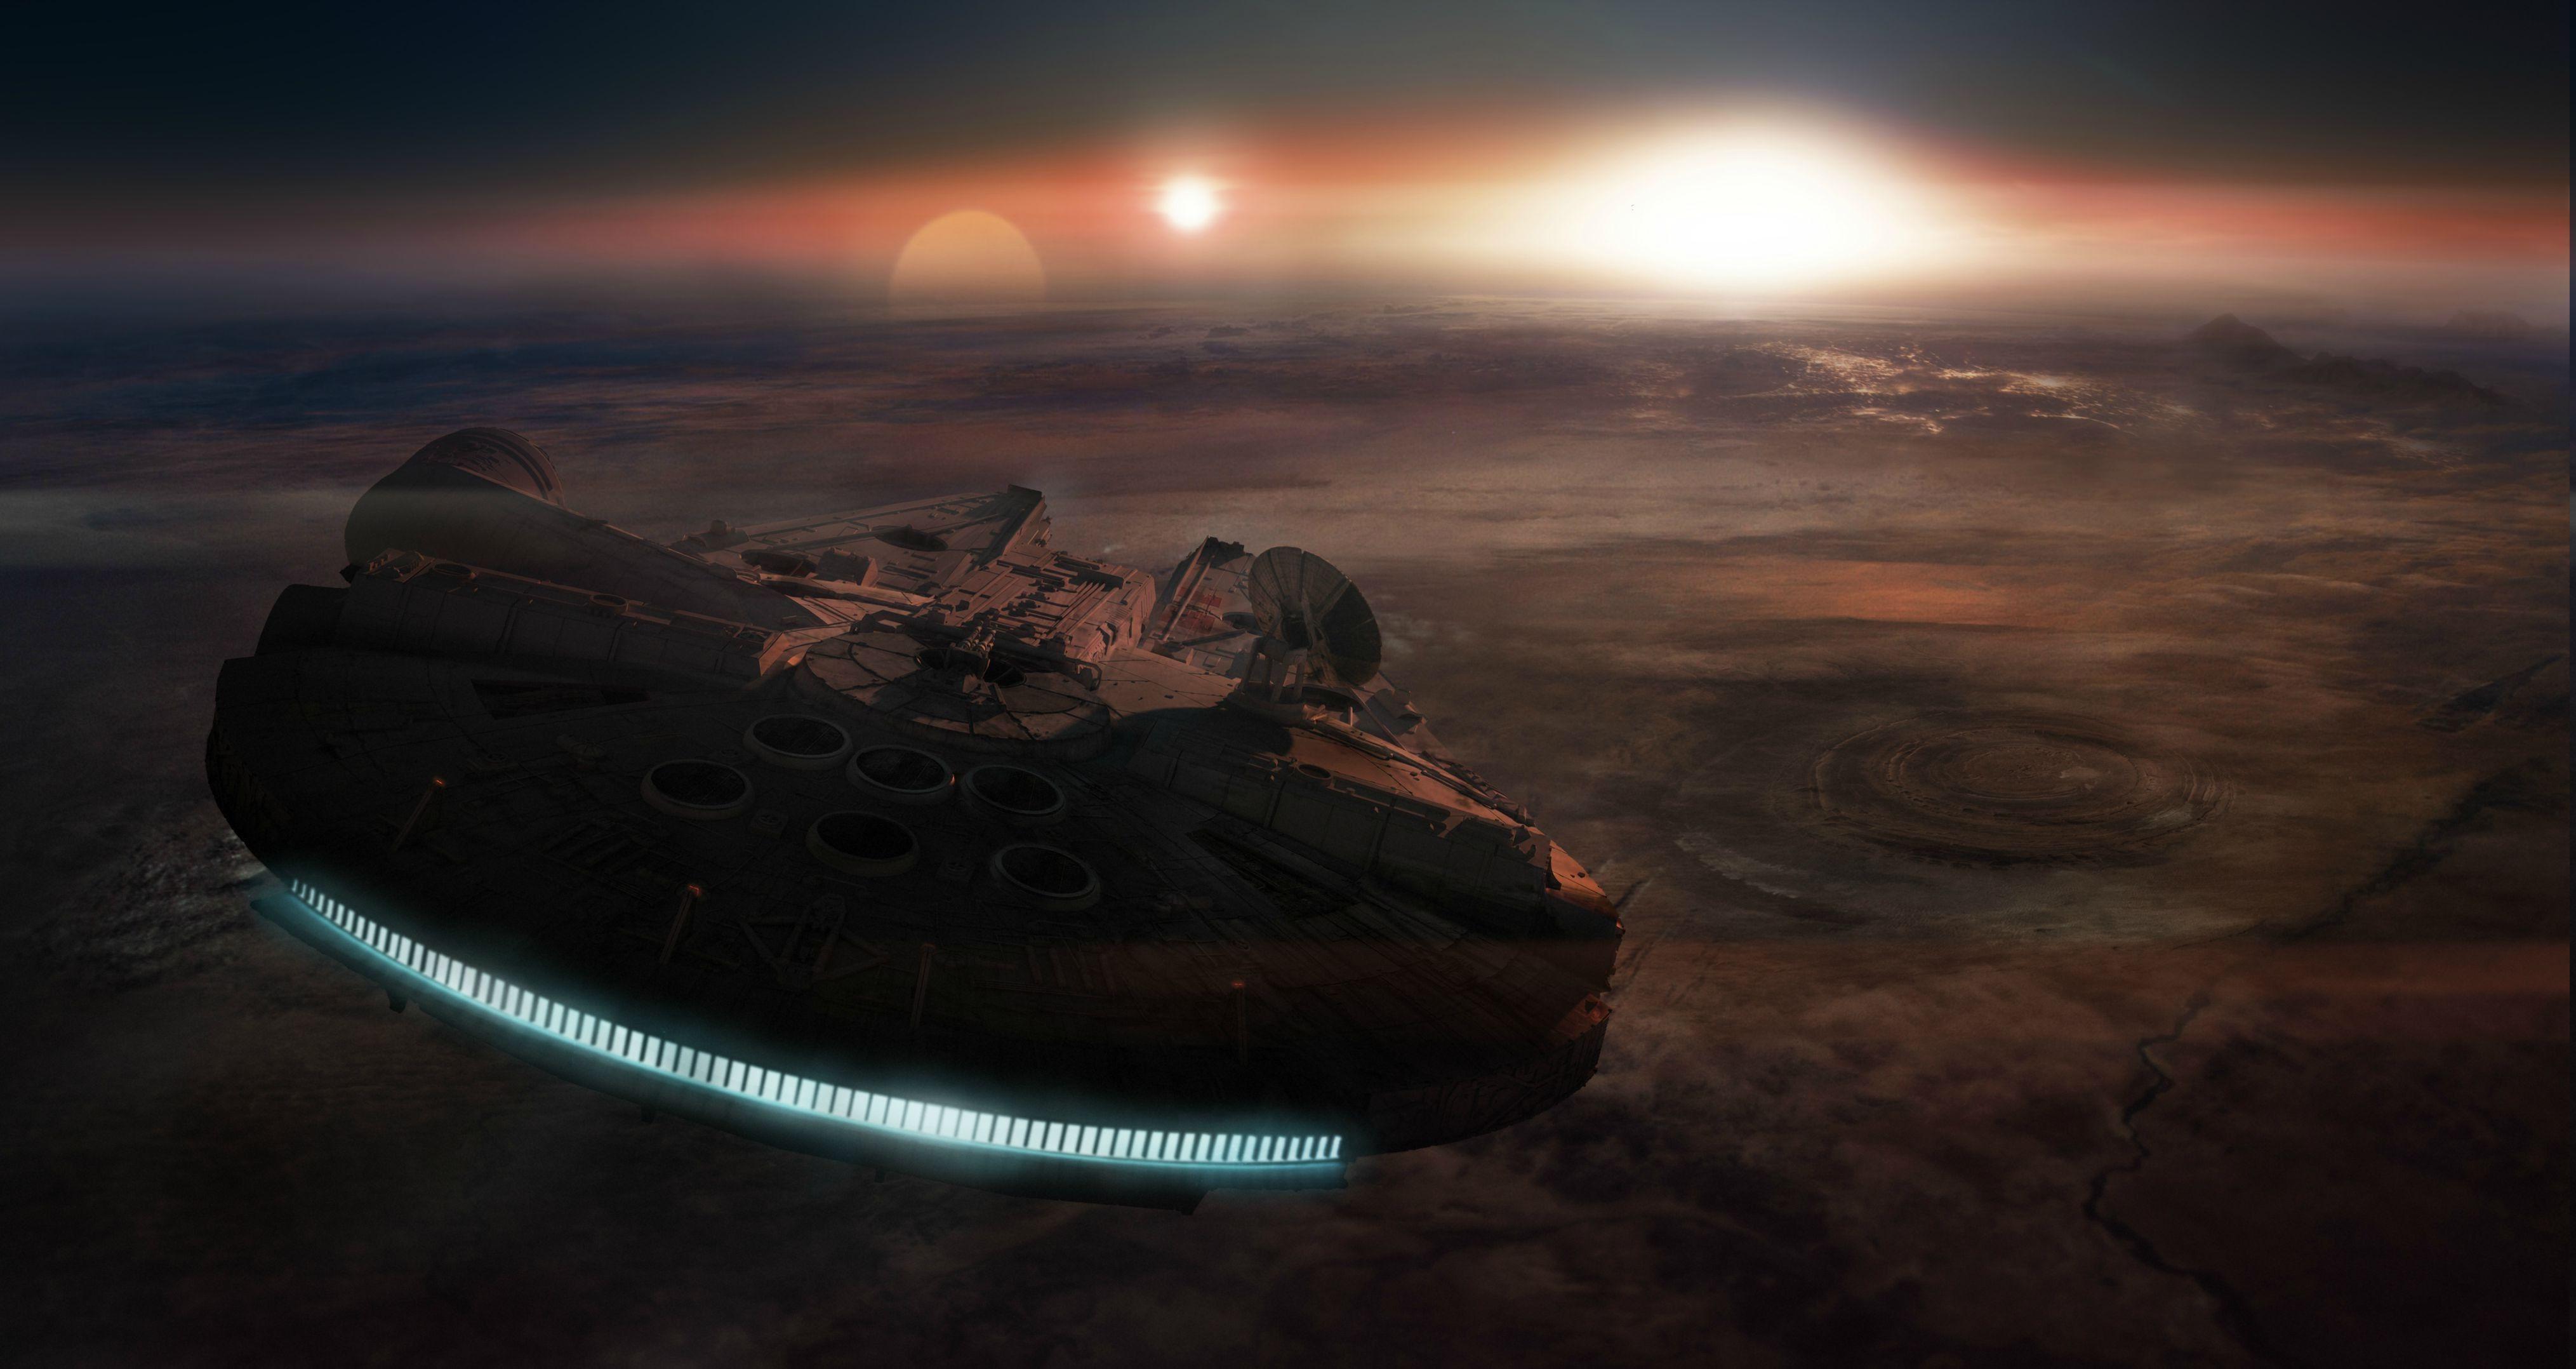 60 Star Wars Landscape Wallpapers Download At Wallpaperbro